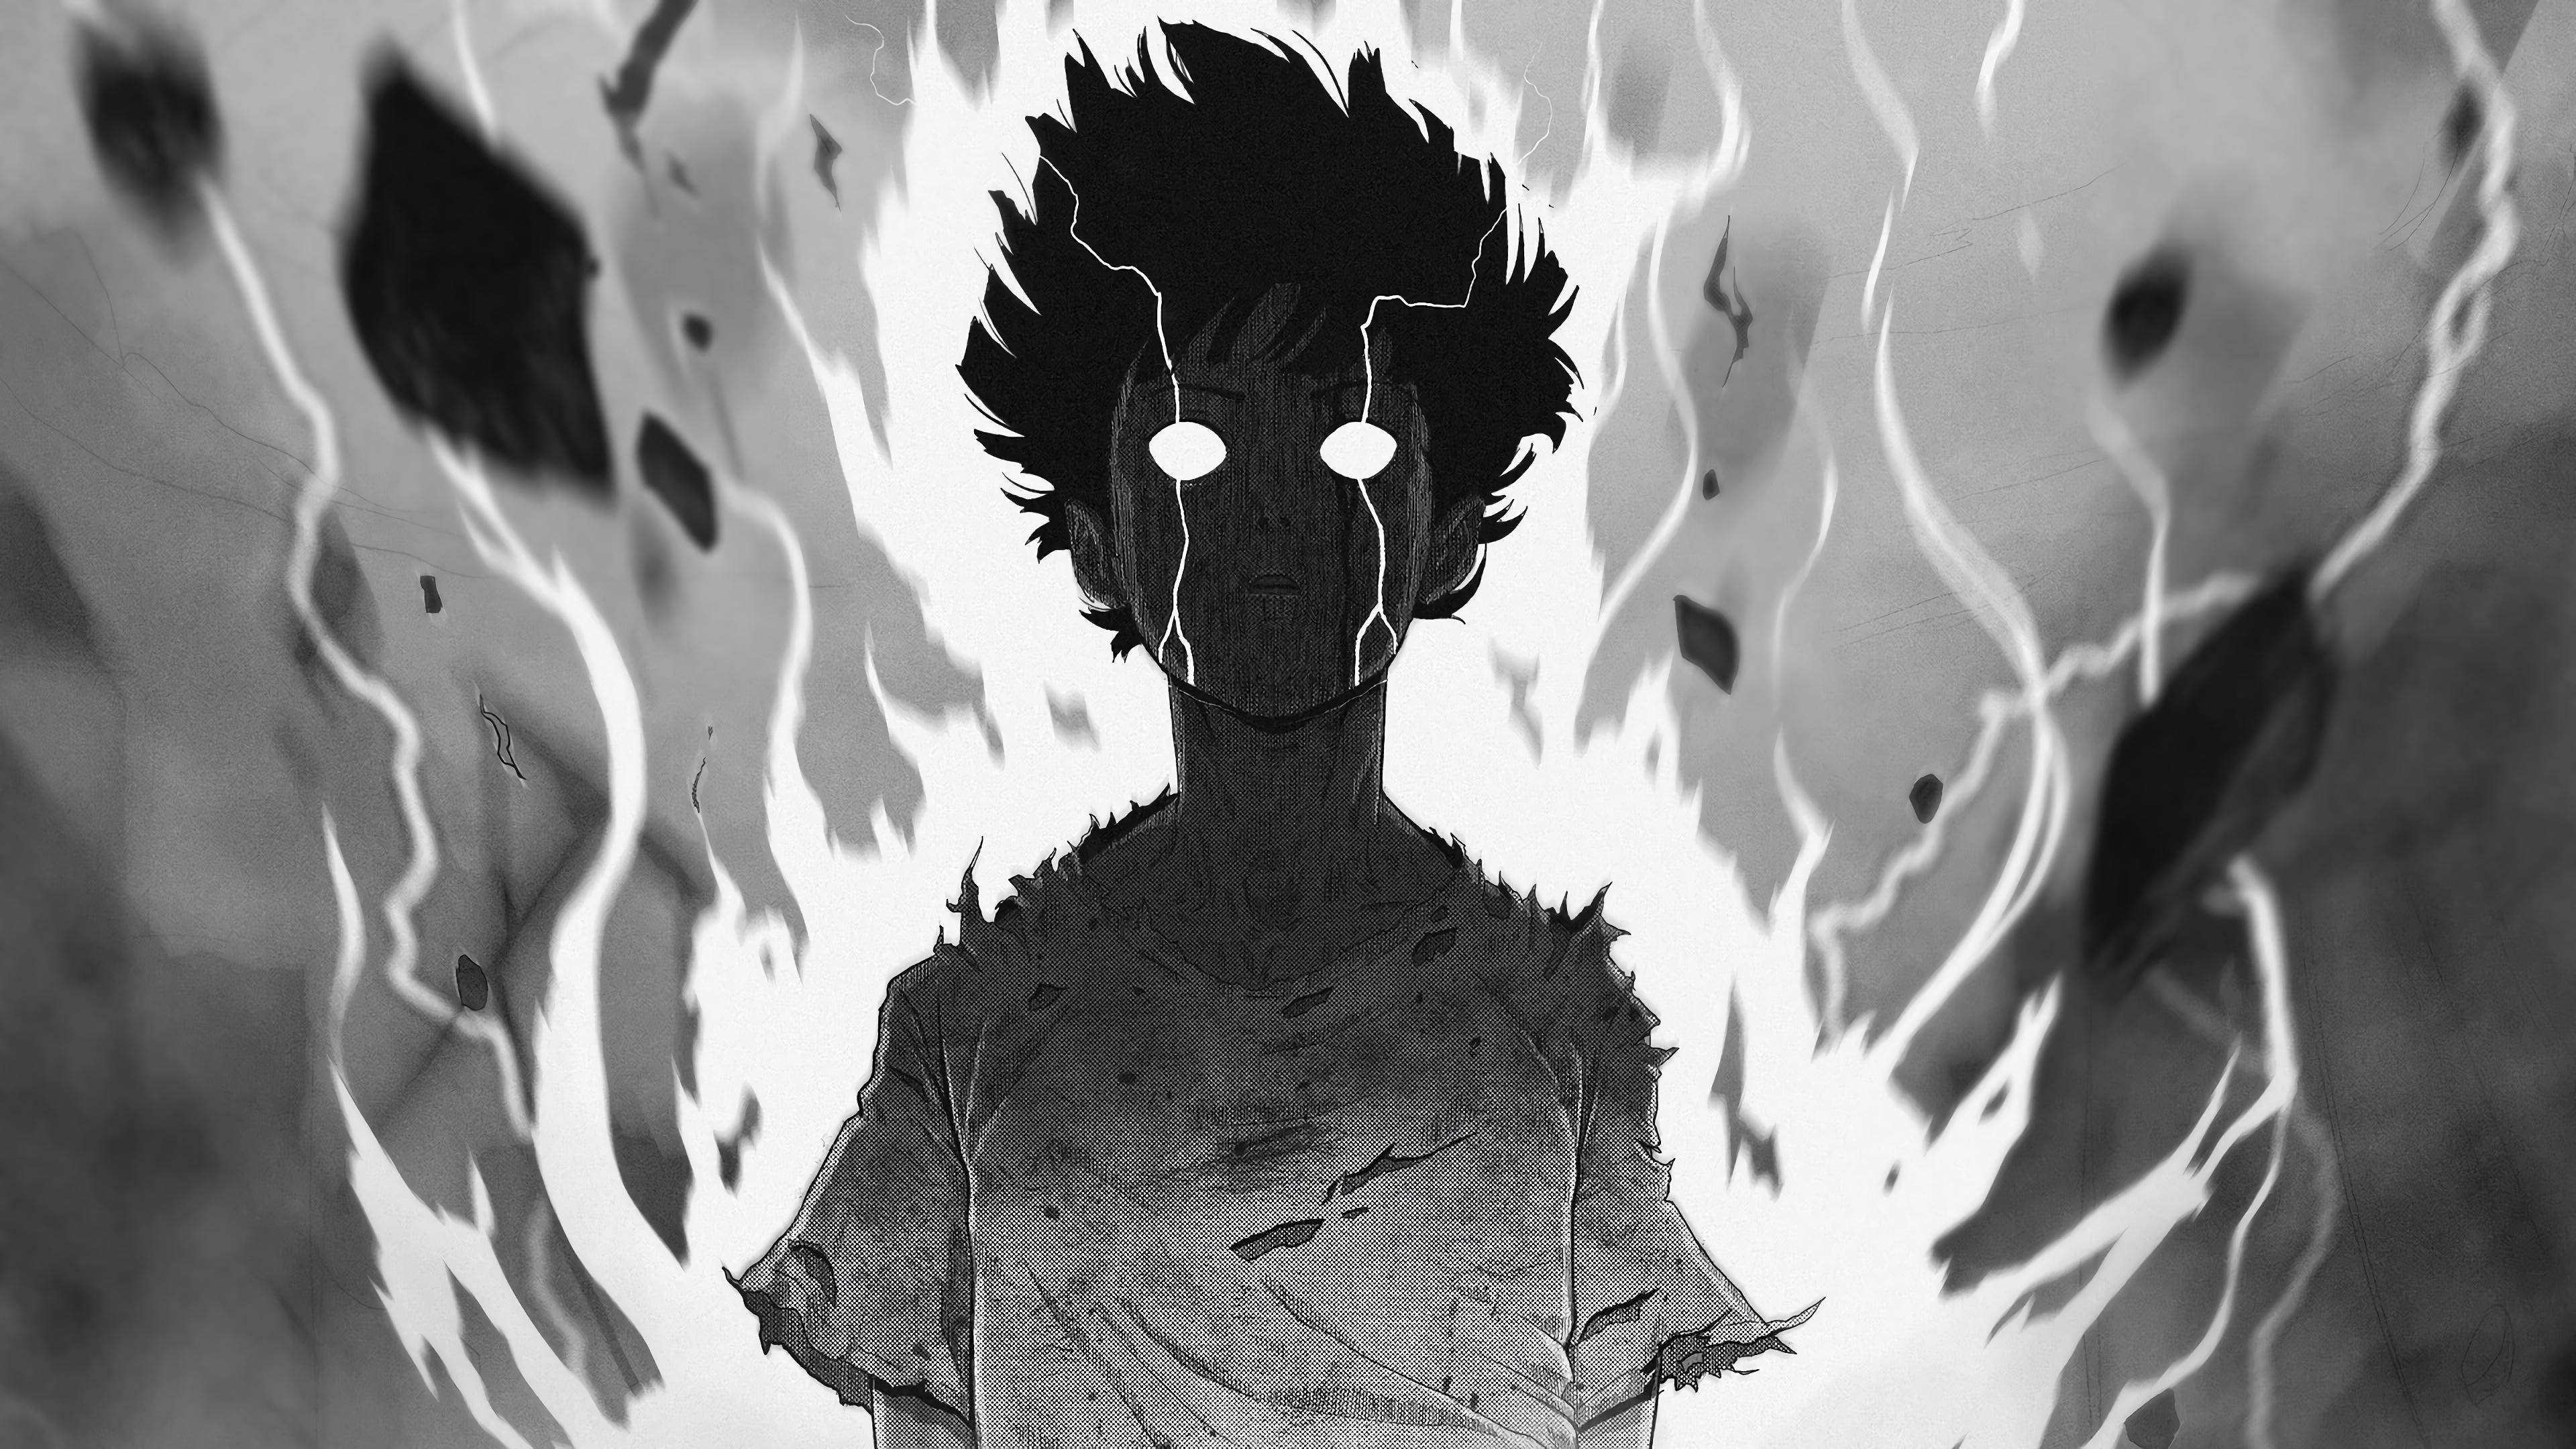 Shigeo Kageyama Rage Mob Psycho 100 4k Wallpaper 1